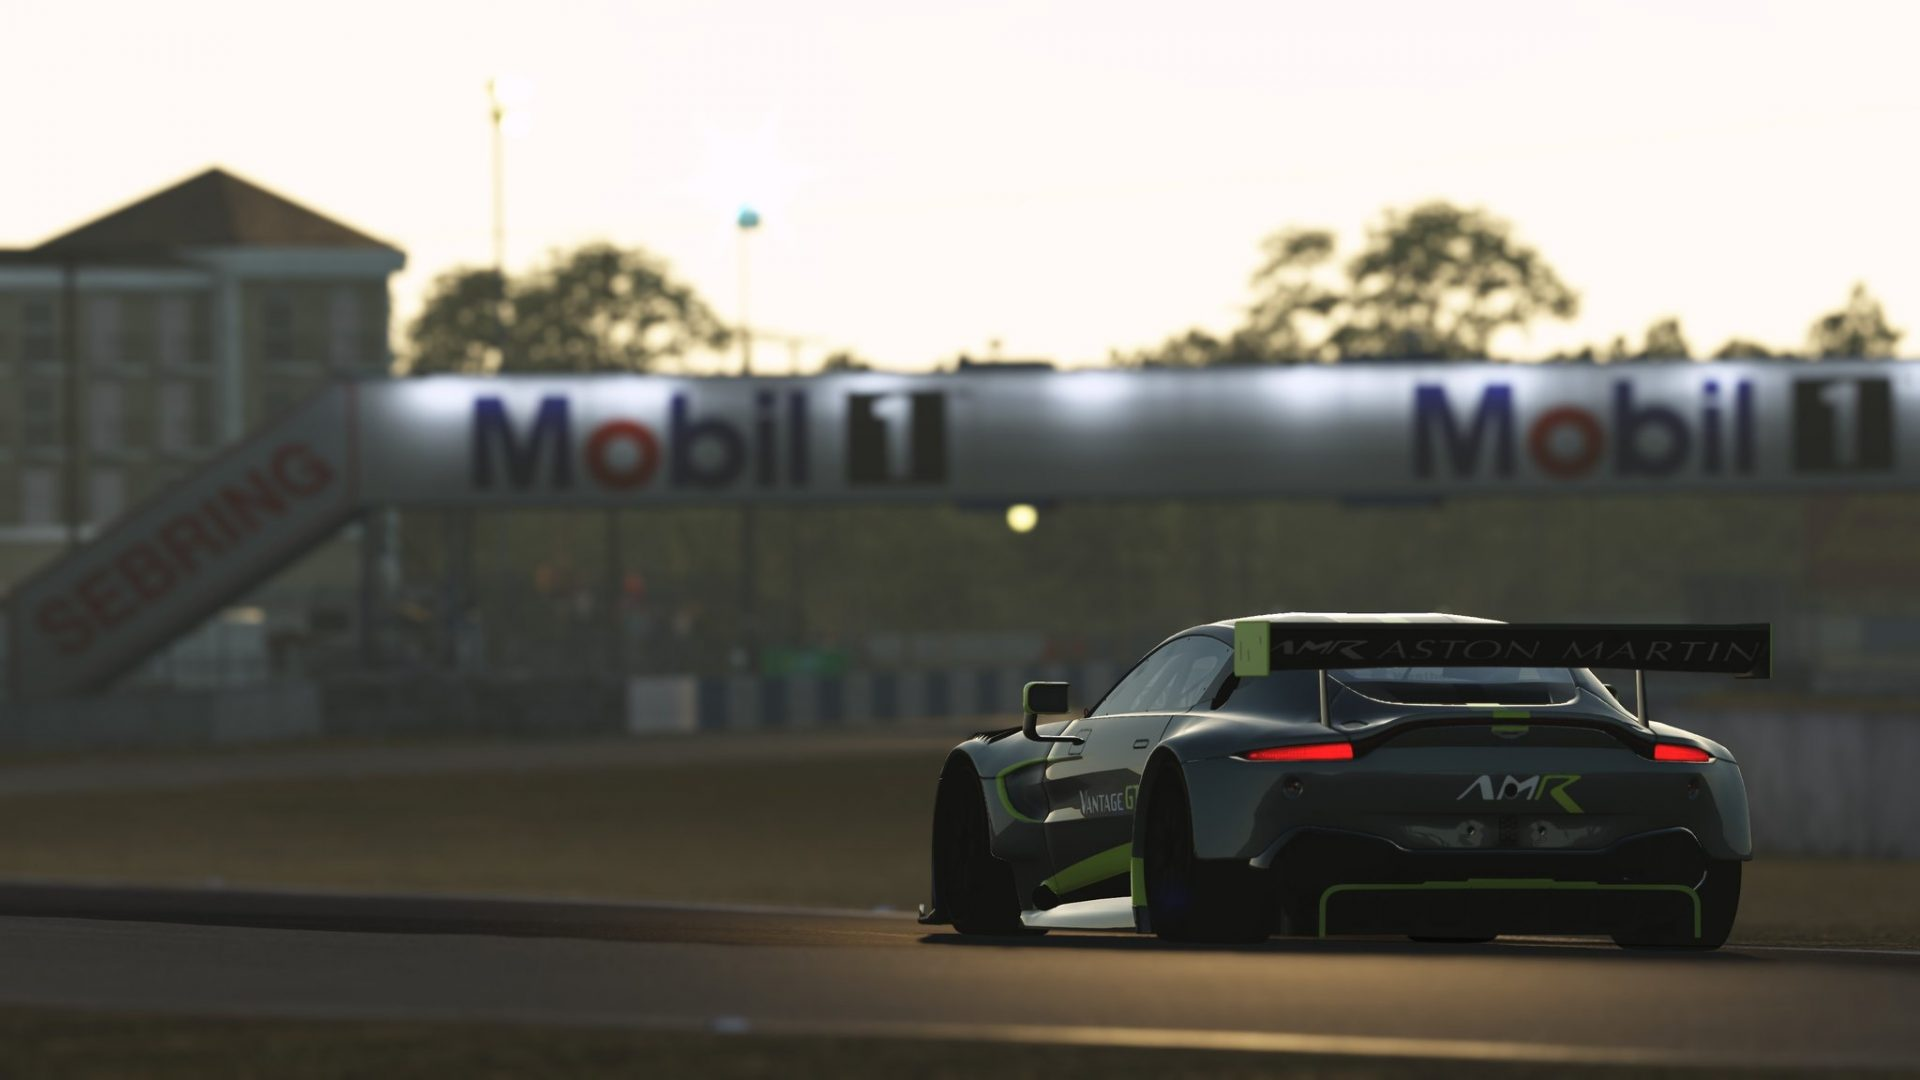 rFactor 2: Aston Martin Vantage finally arrives for GT3 Challengers